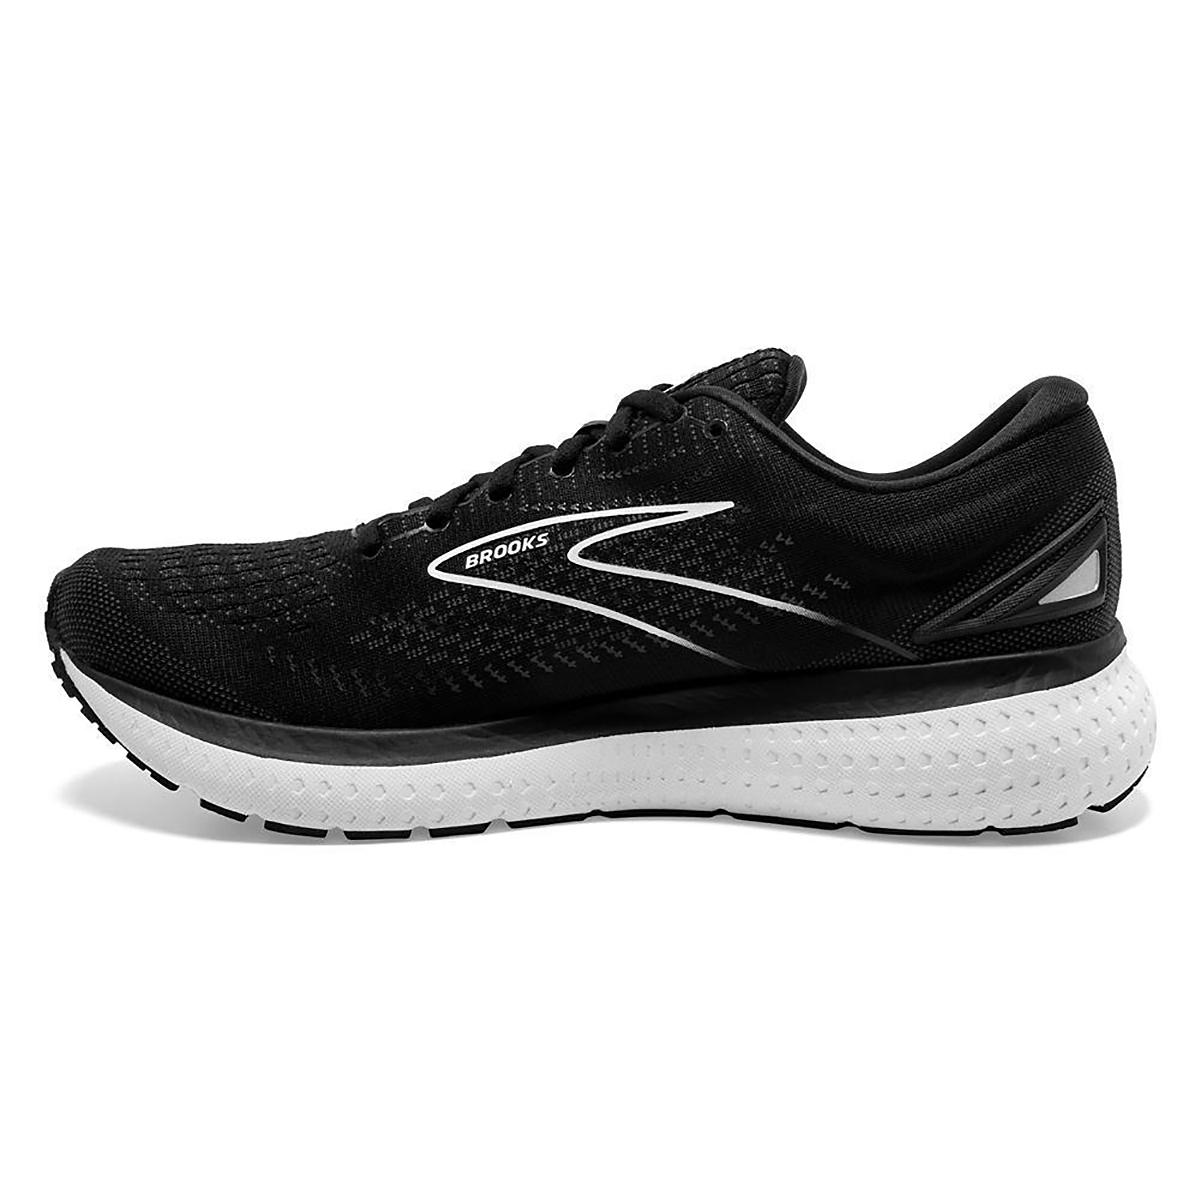 Men's Brooks Glycerin 19 Running Shoe - Color: Black/White - Size: 7 - Width: Regular, Black/White, large, image 2